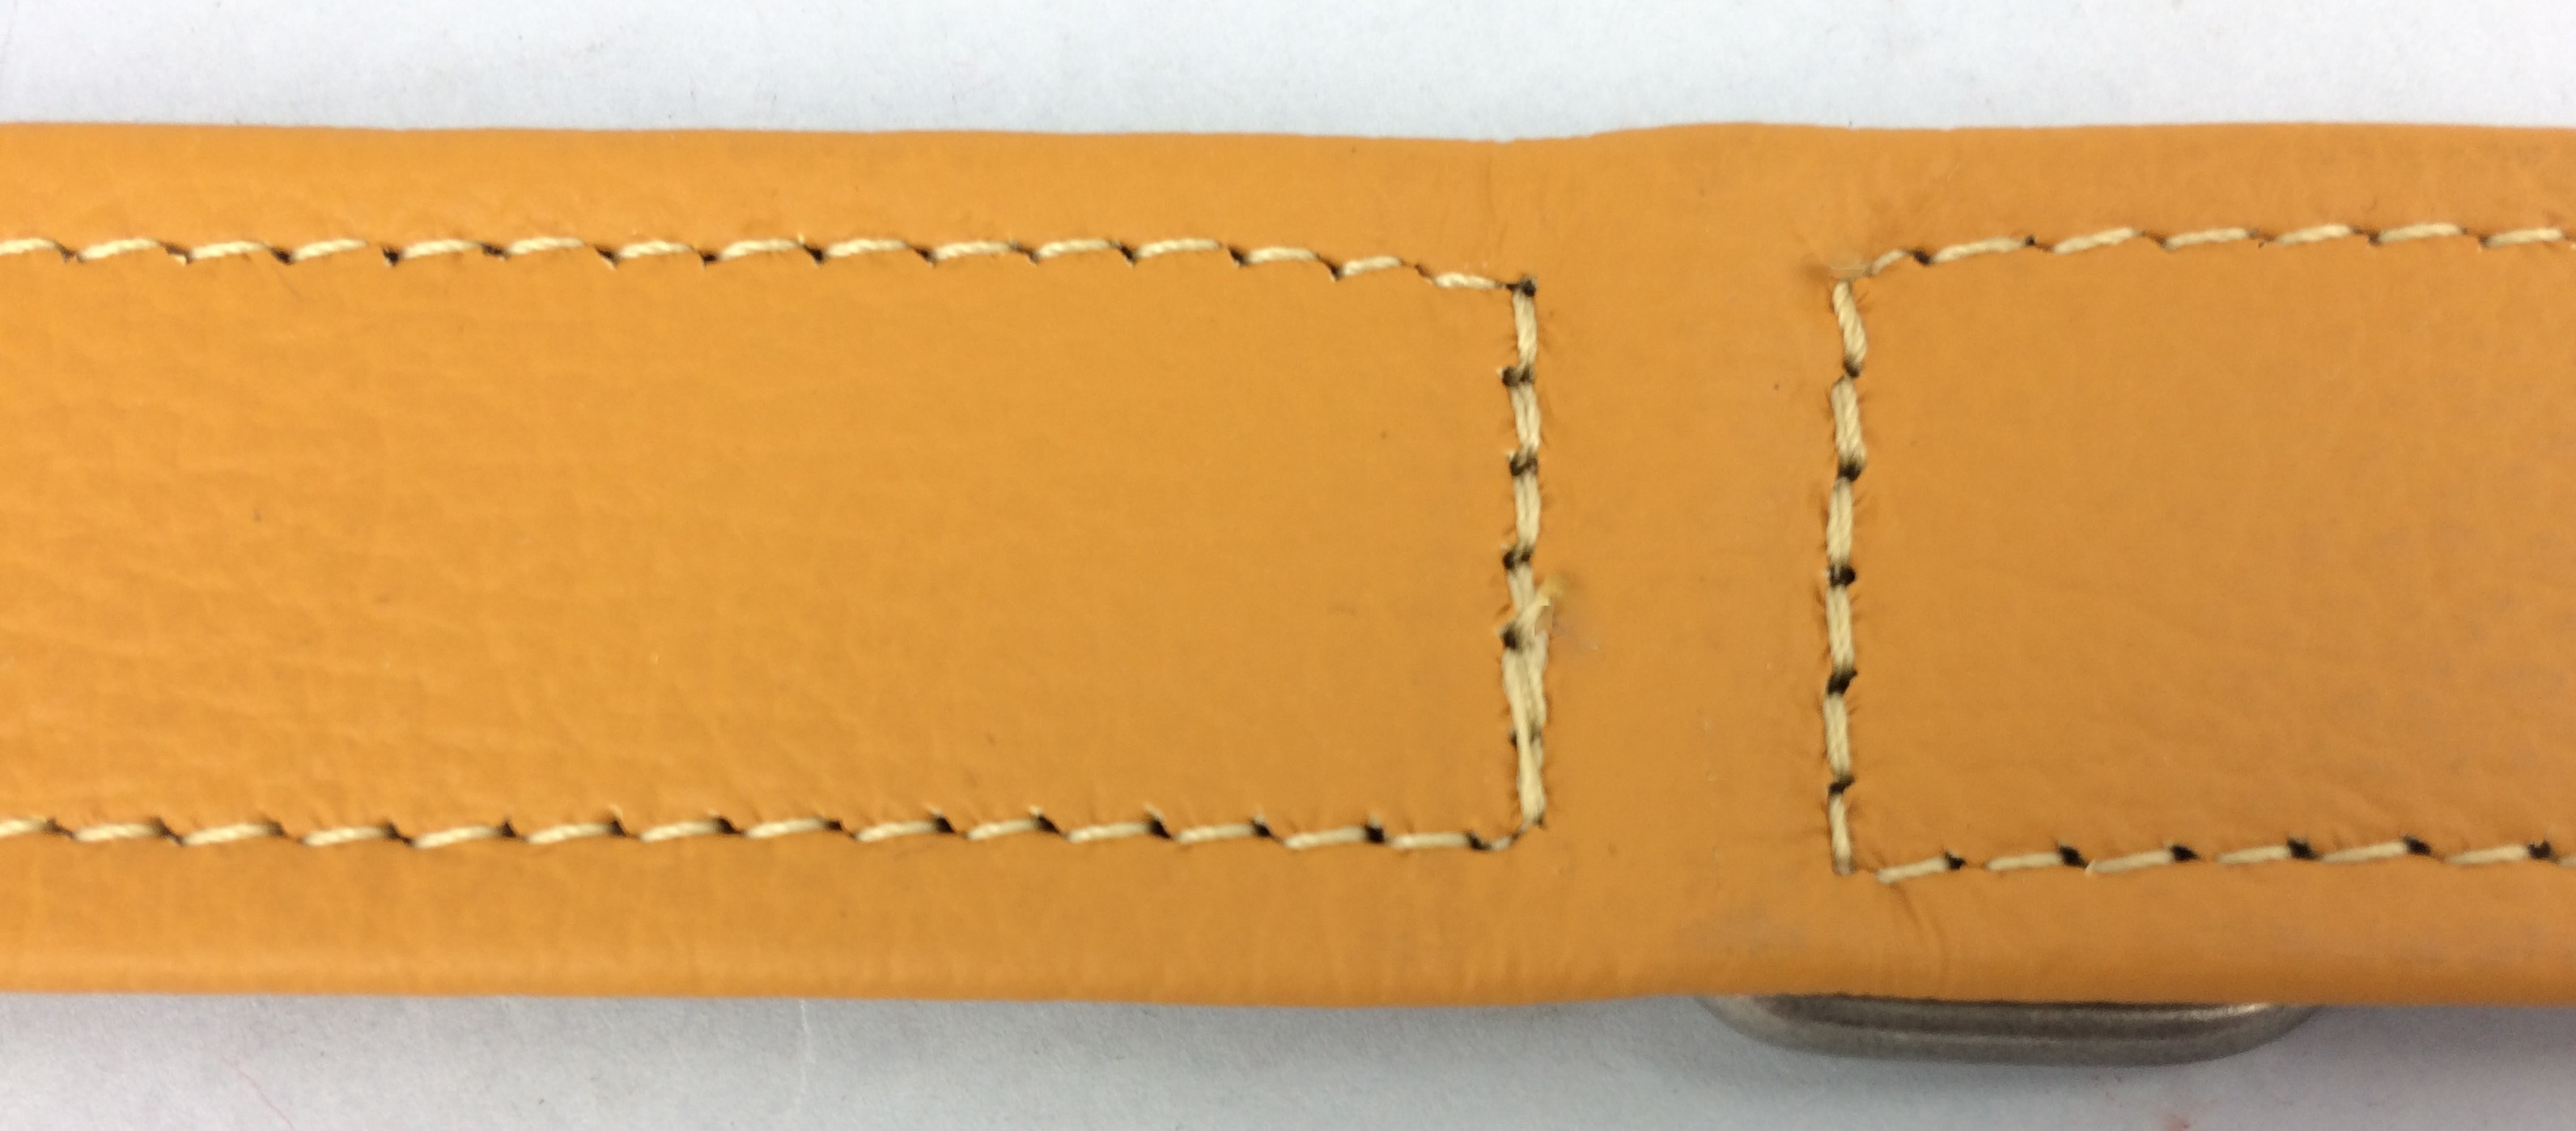 Halsband Montana Rustic lichtbruin